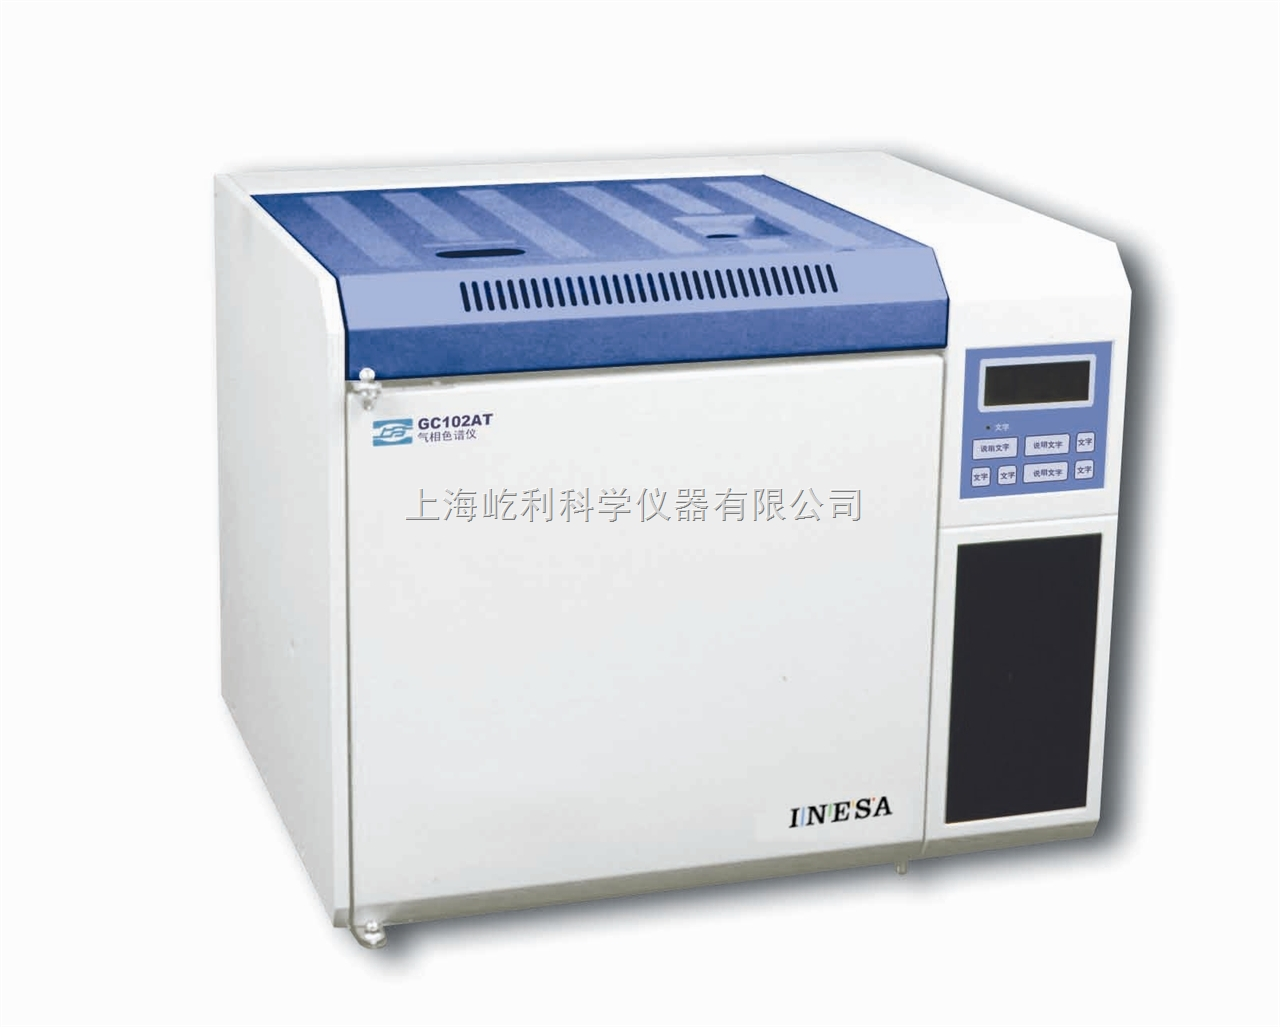 GC102NJ 上海儀電 白酒分析色譜儀